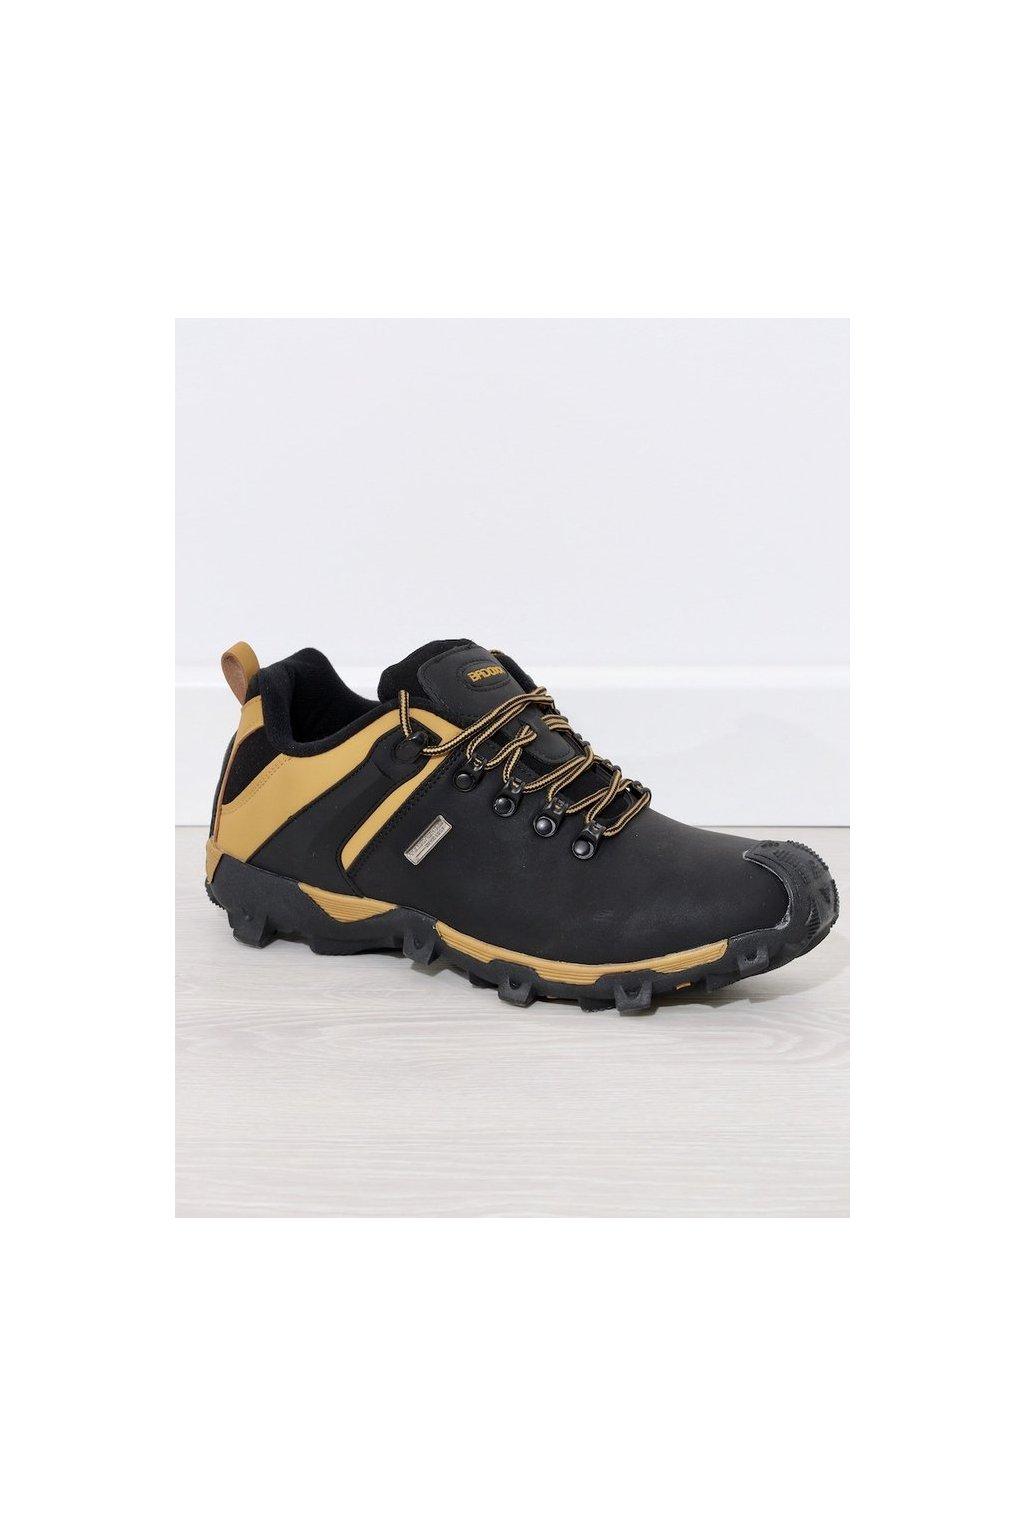 Pánske topánky trapery čierne kód - GM